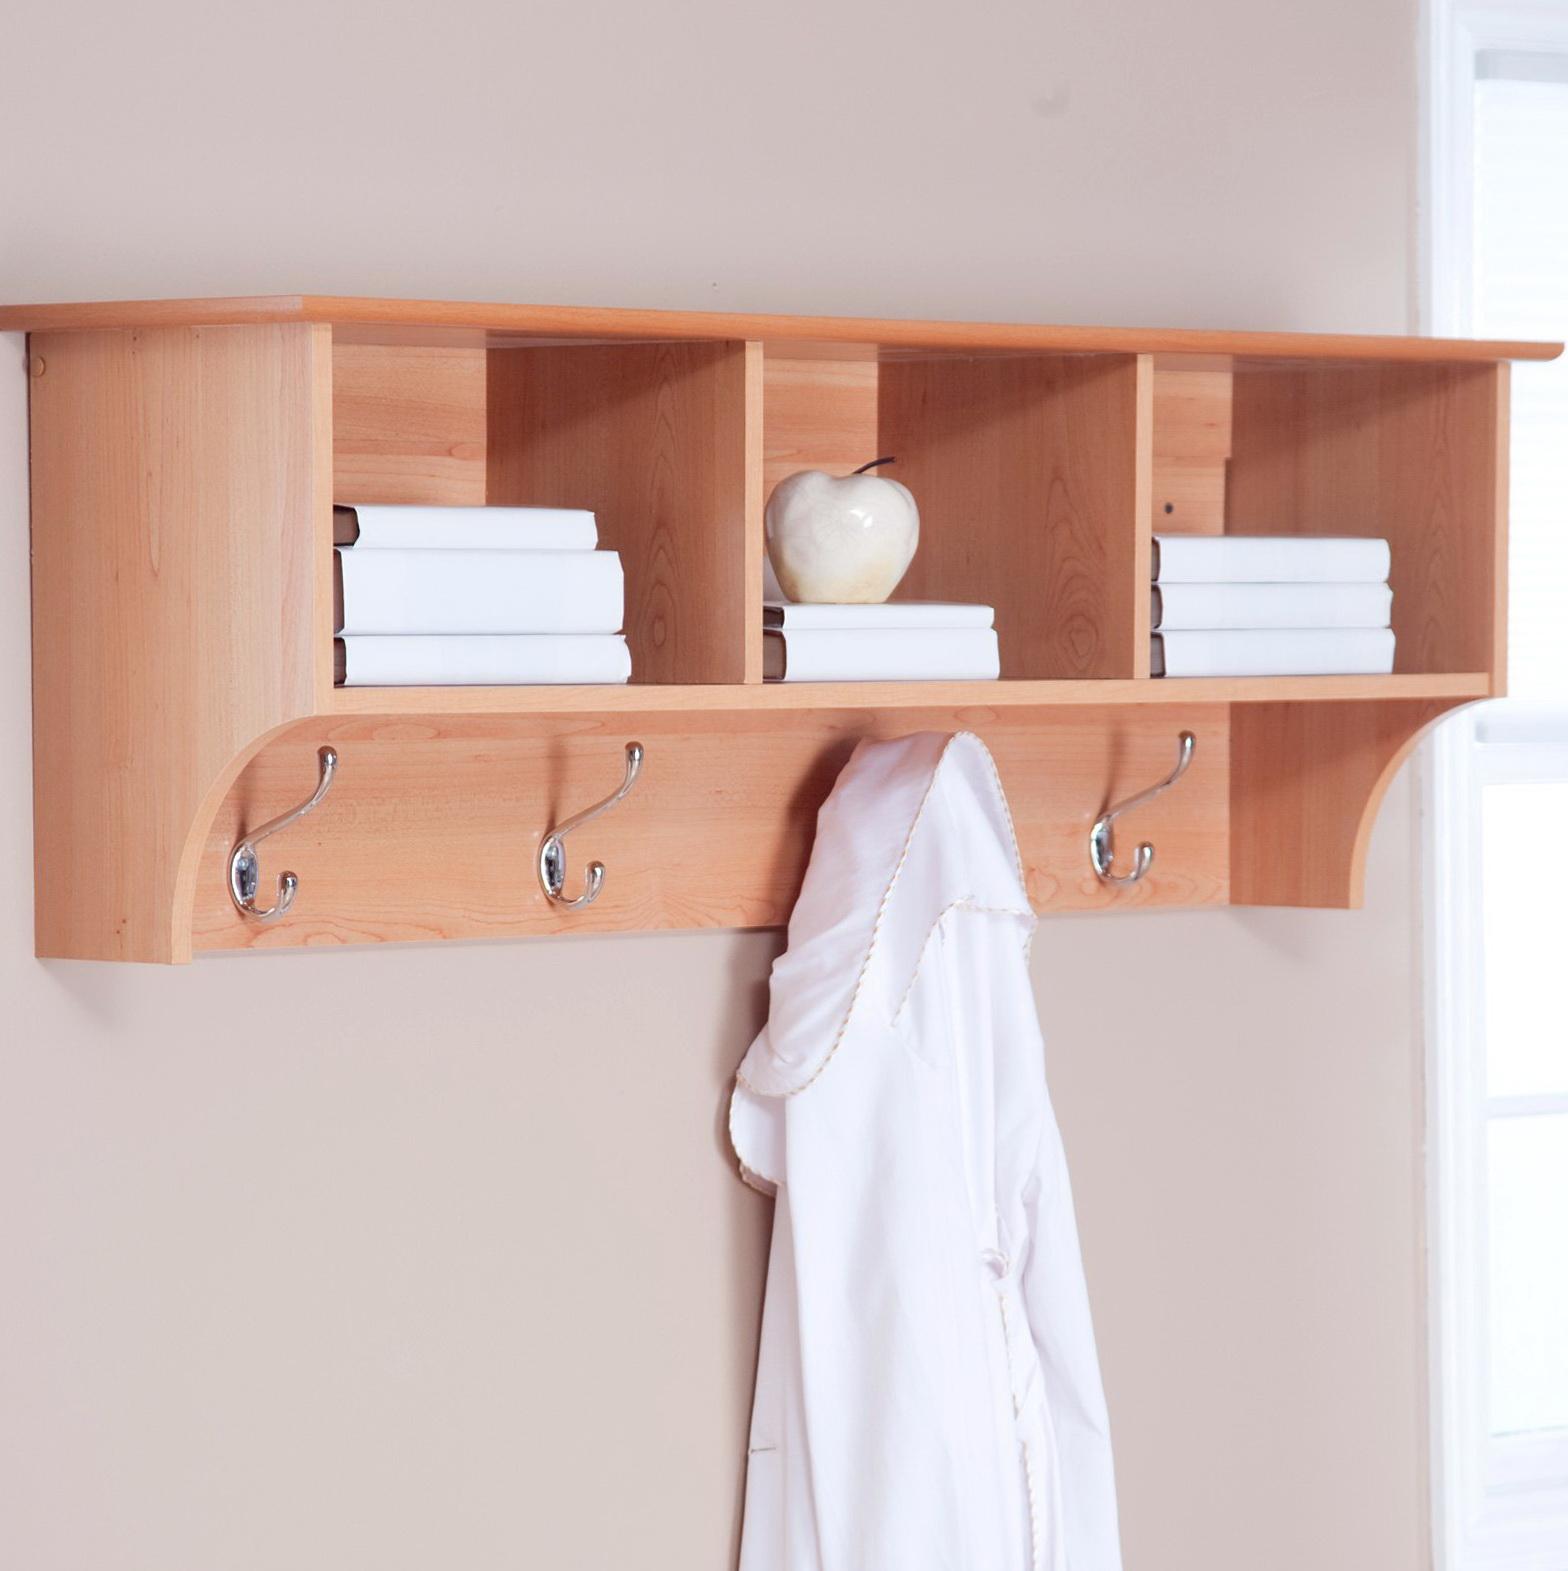 Diy Wall Coat Rack With Shelf